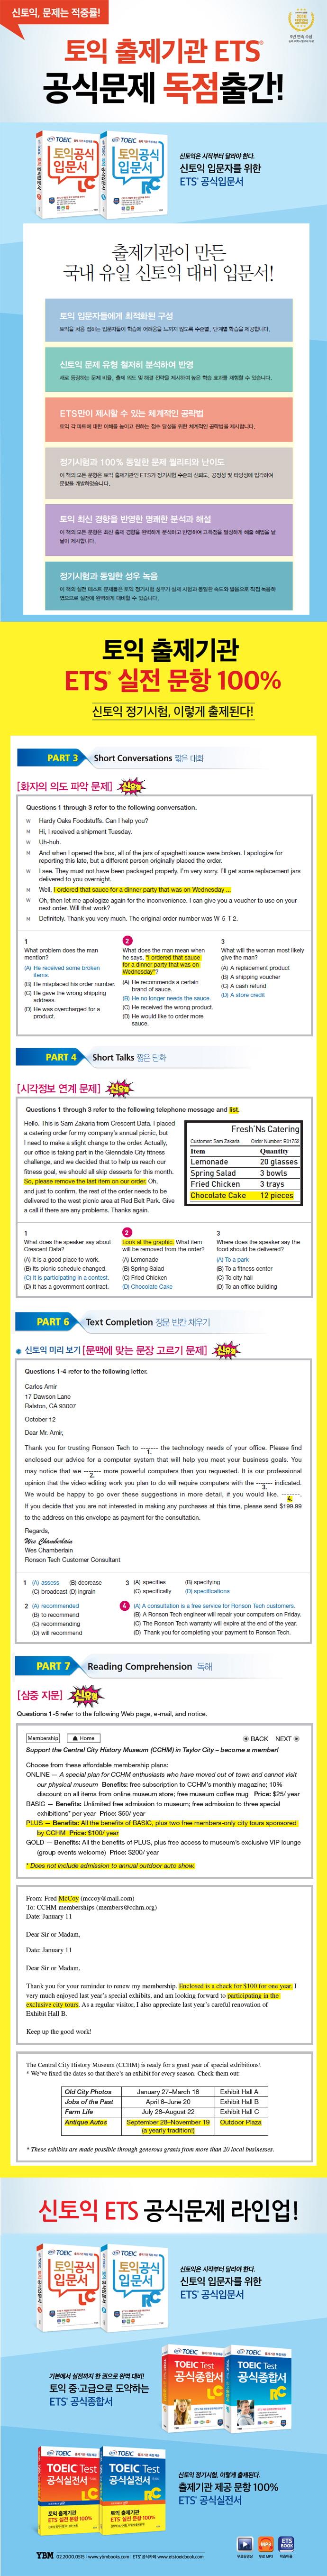 ETS 토익 공식입문서 RC 도서 상세이미지